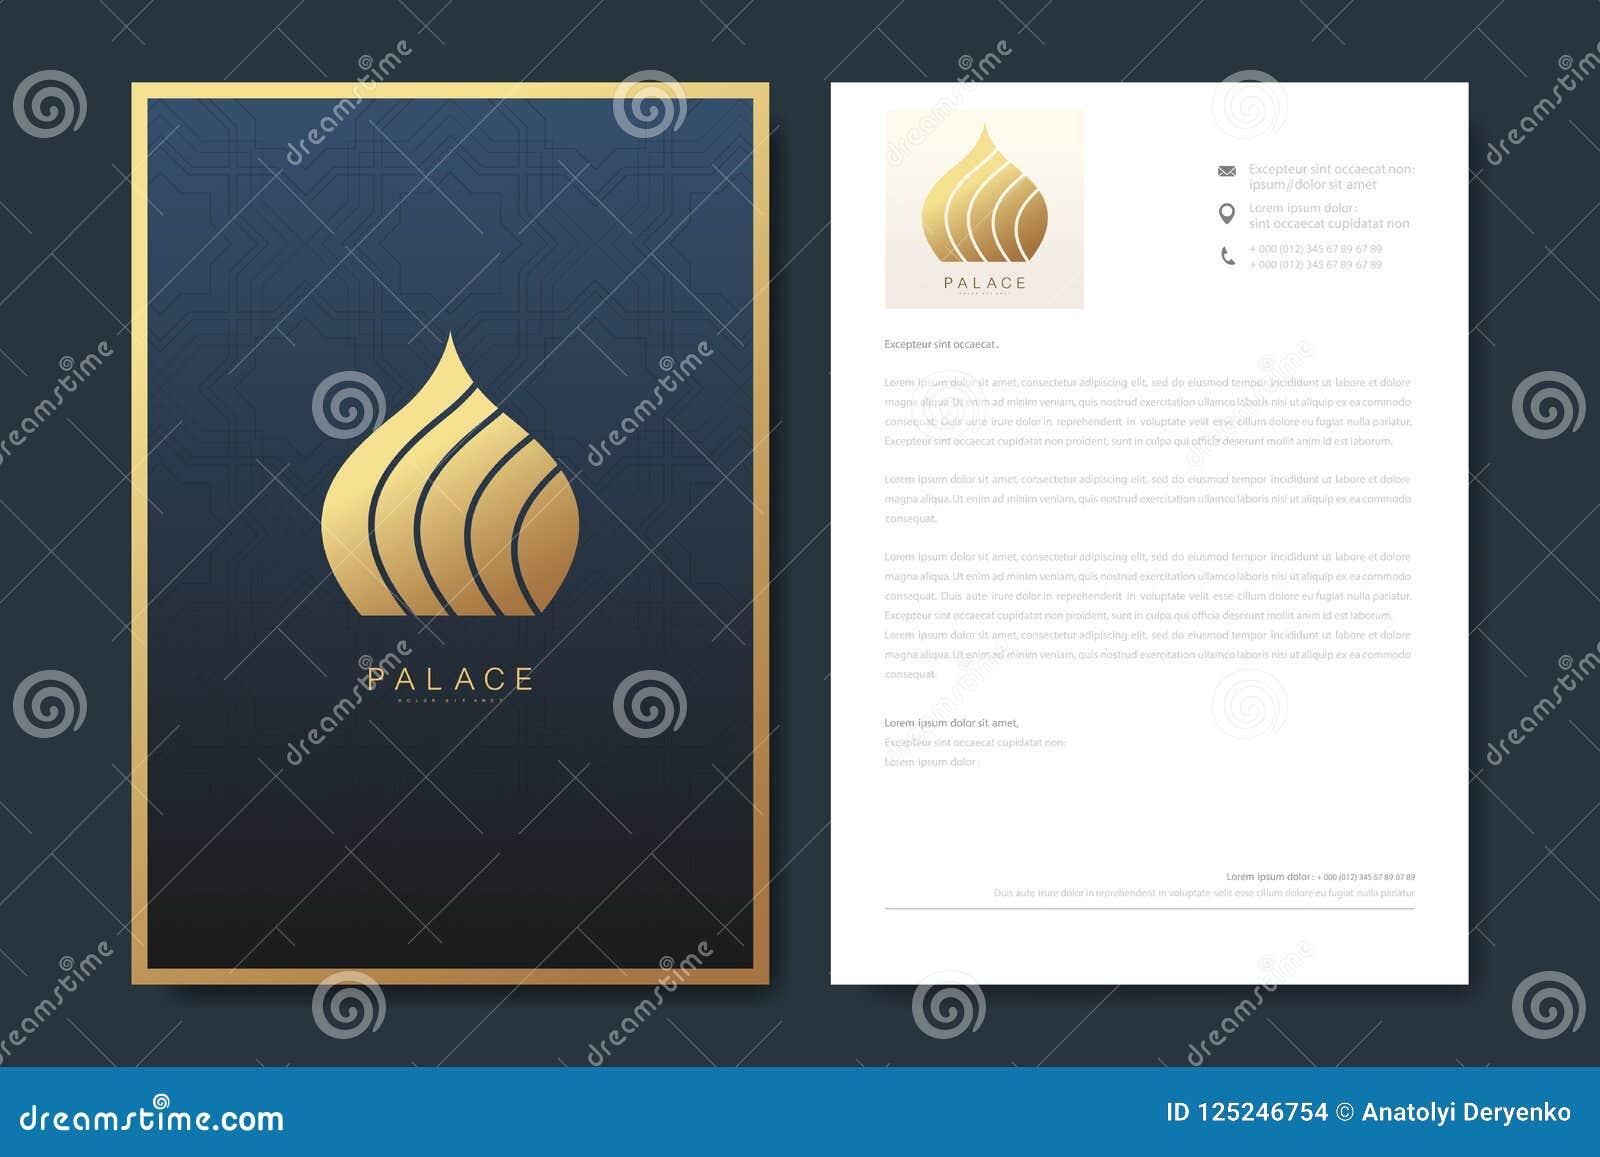 Elegant Letterhead Template Design In Minimalist Style With Logo ...